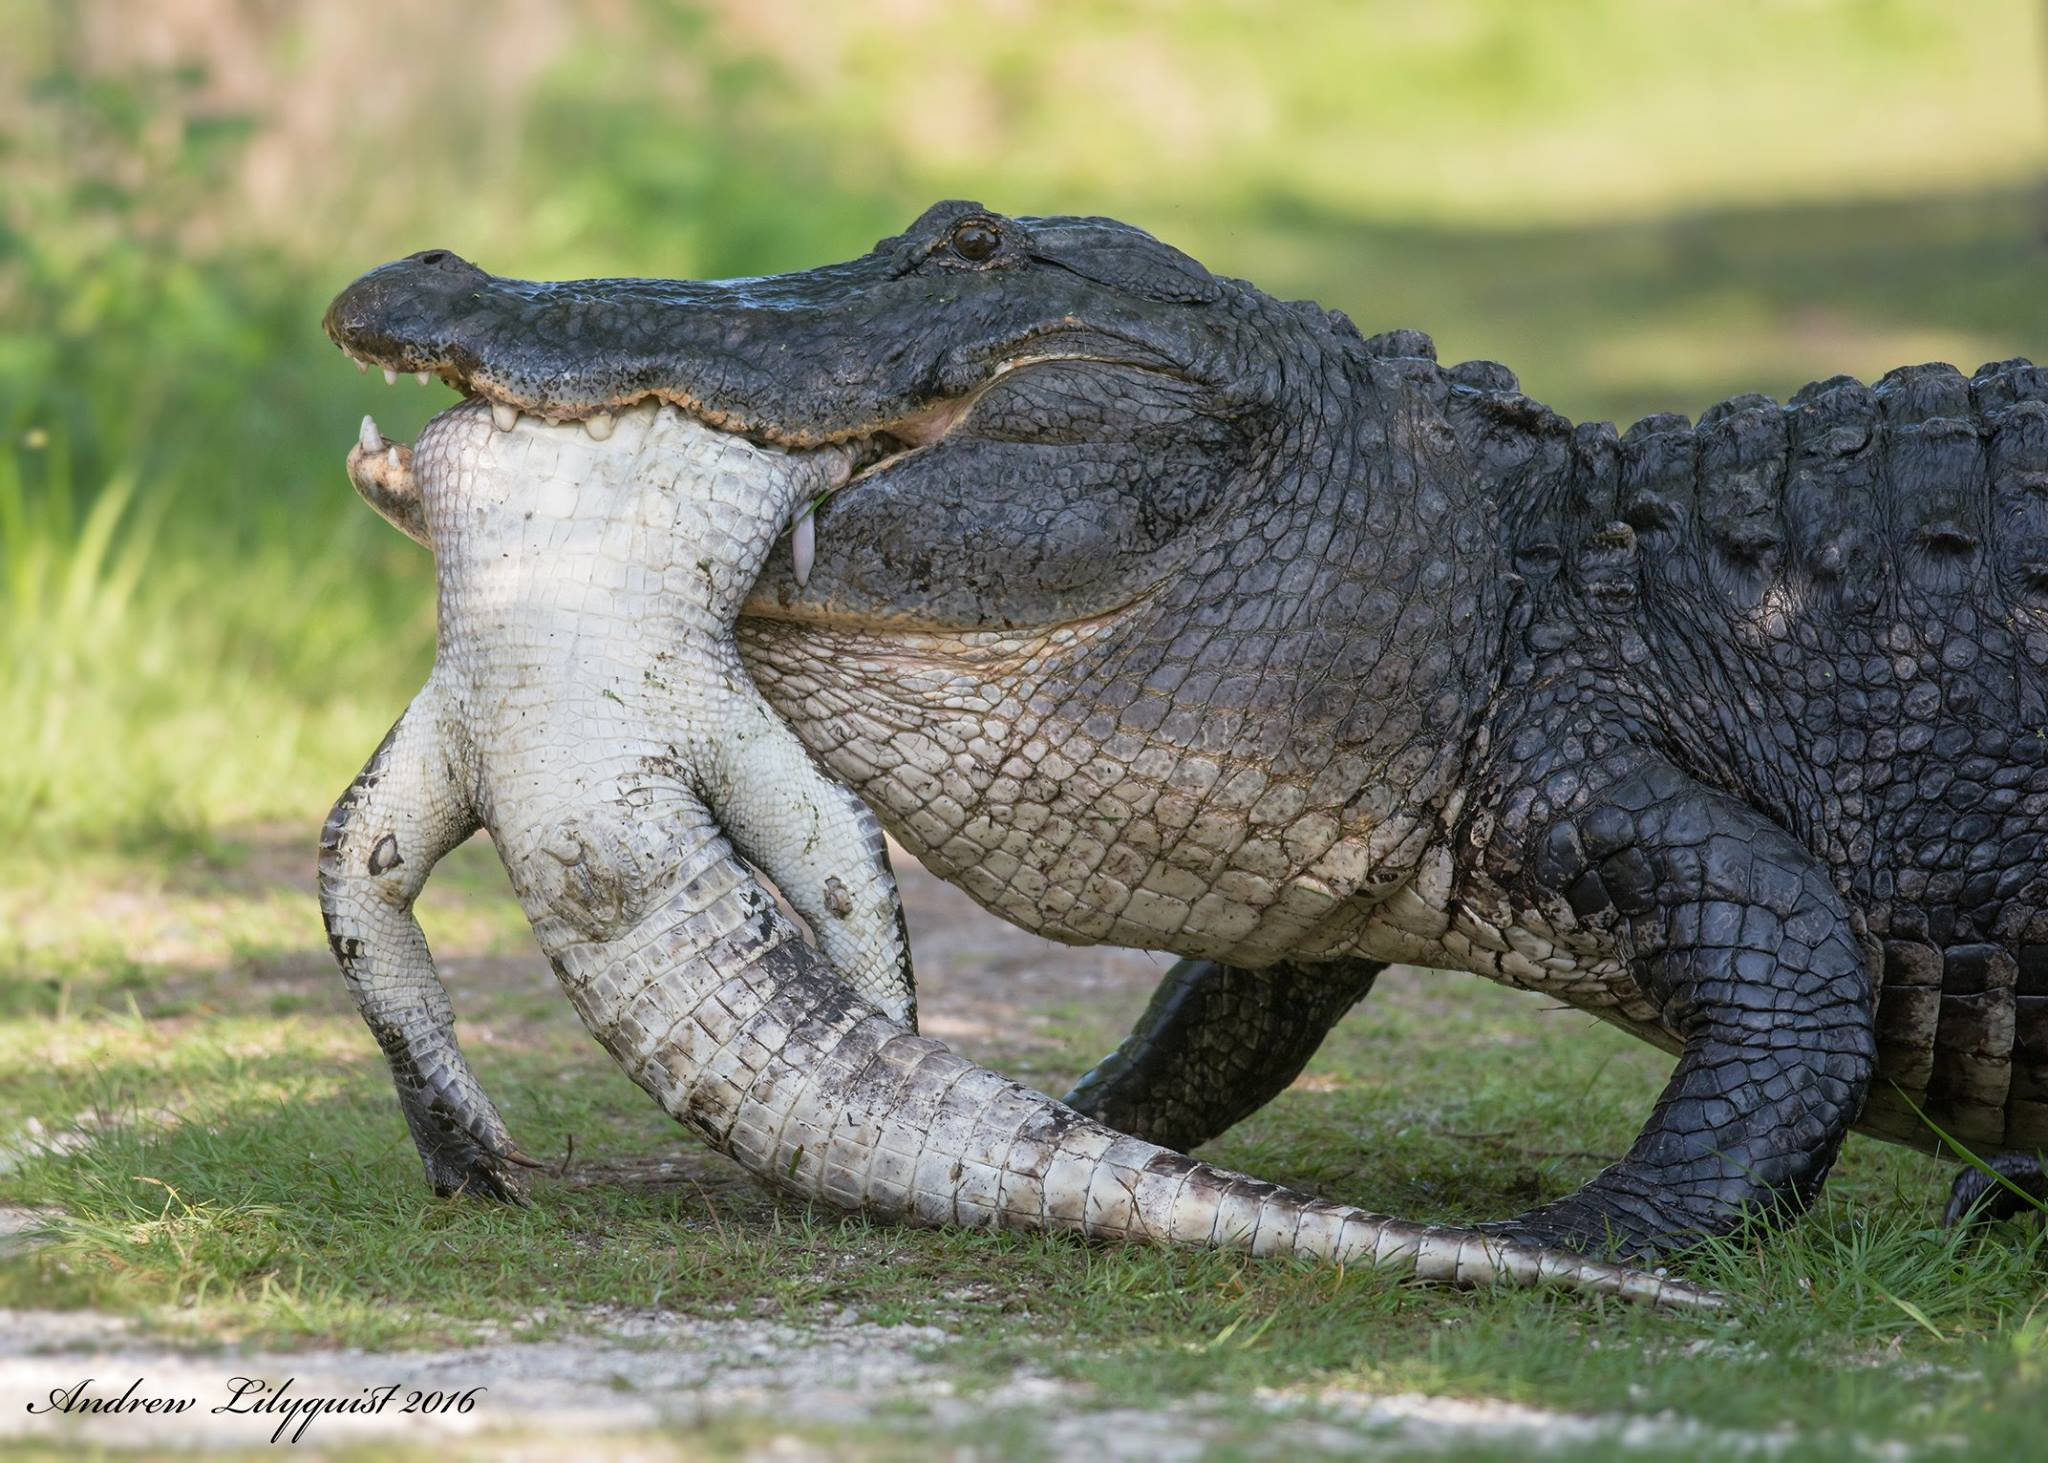 Alligator Eats Another Alligator In An Alligator Reserve